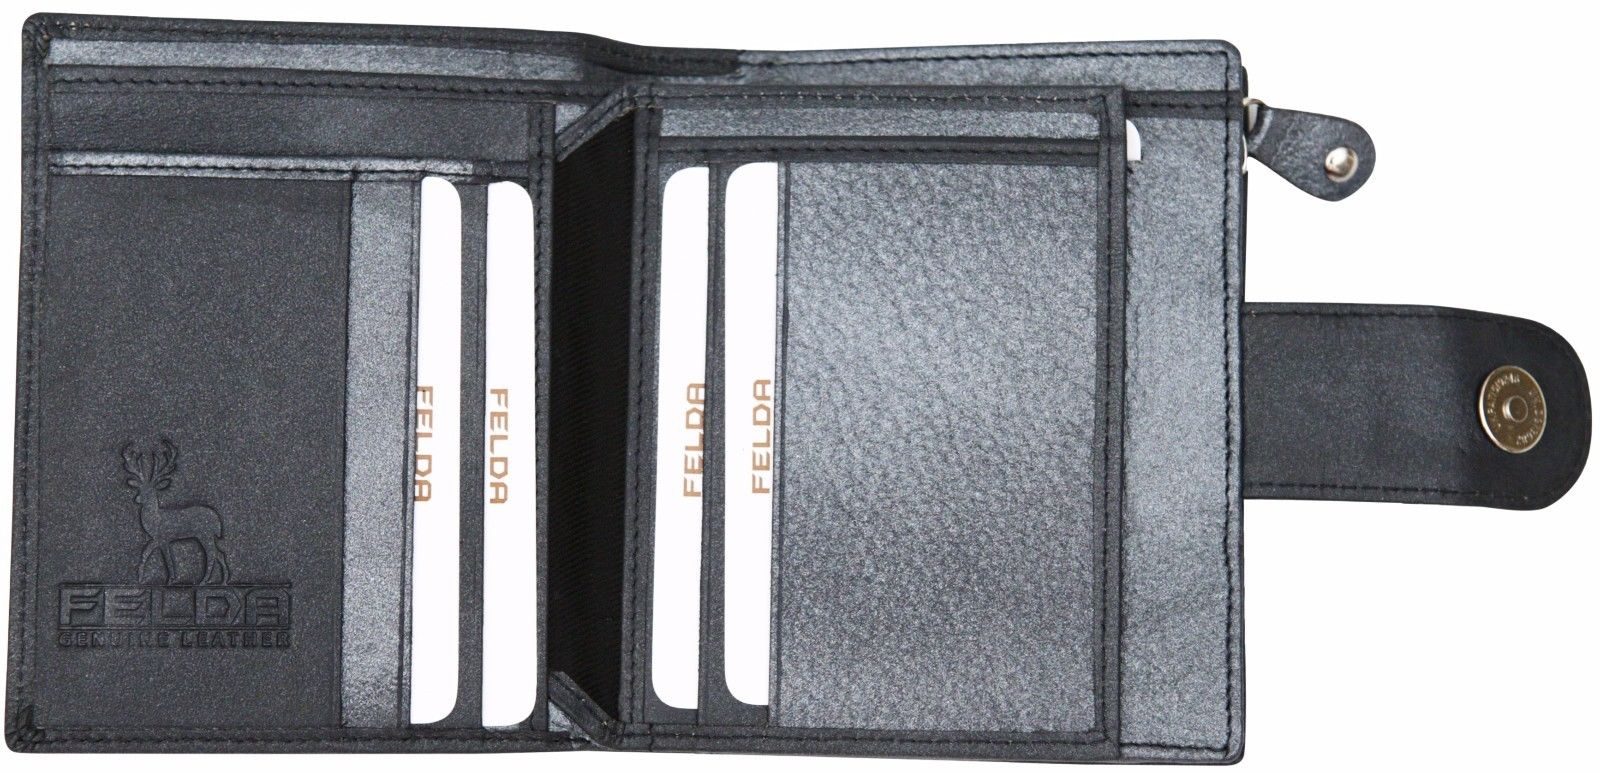 Felda-RFID-onorevoli-MEDAGLIA-amp-Card-Purse-Wallet-Genuine-Leather-Multi-SOFT-BOX-REGALO miniatura 50